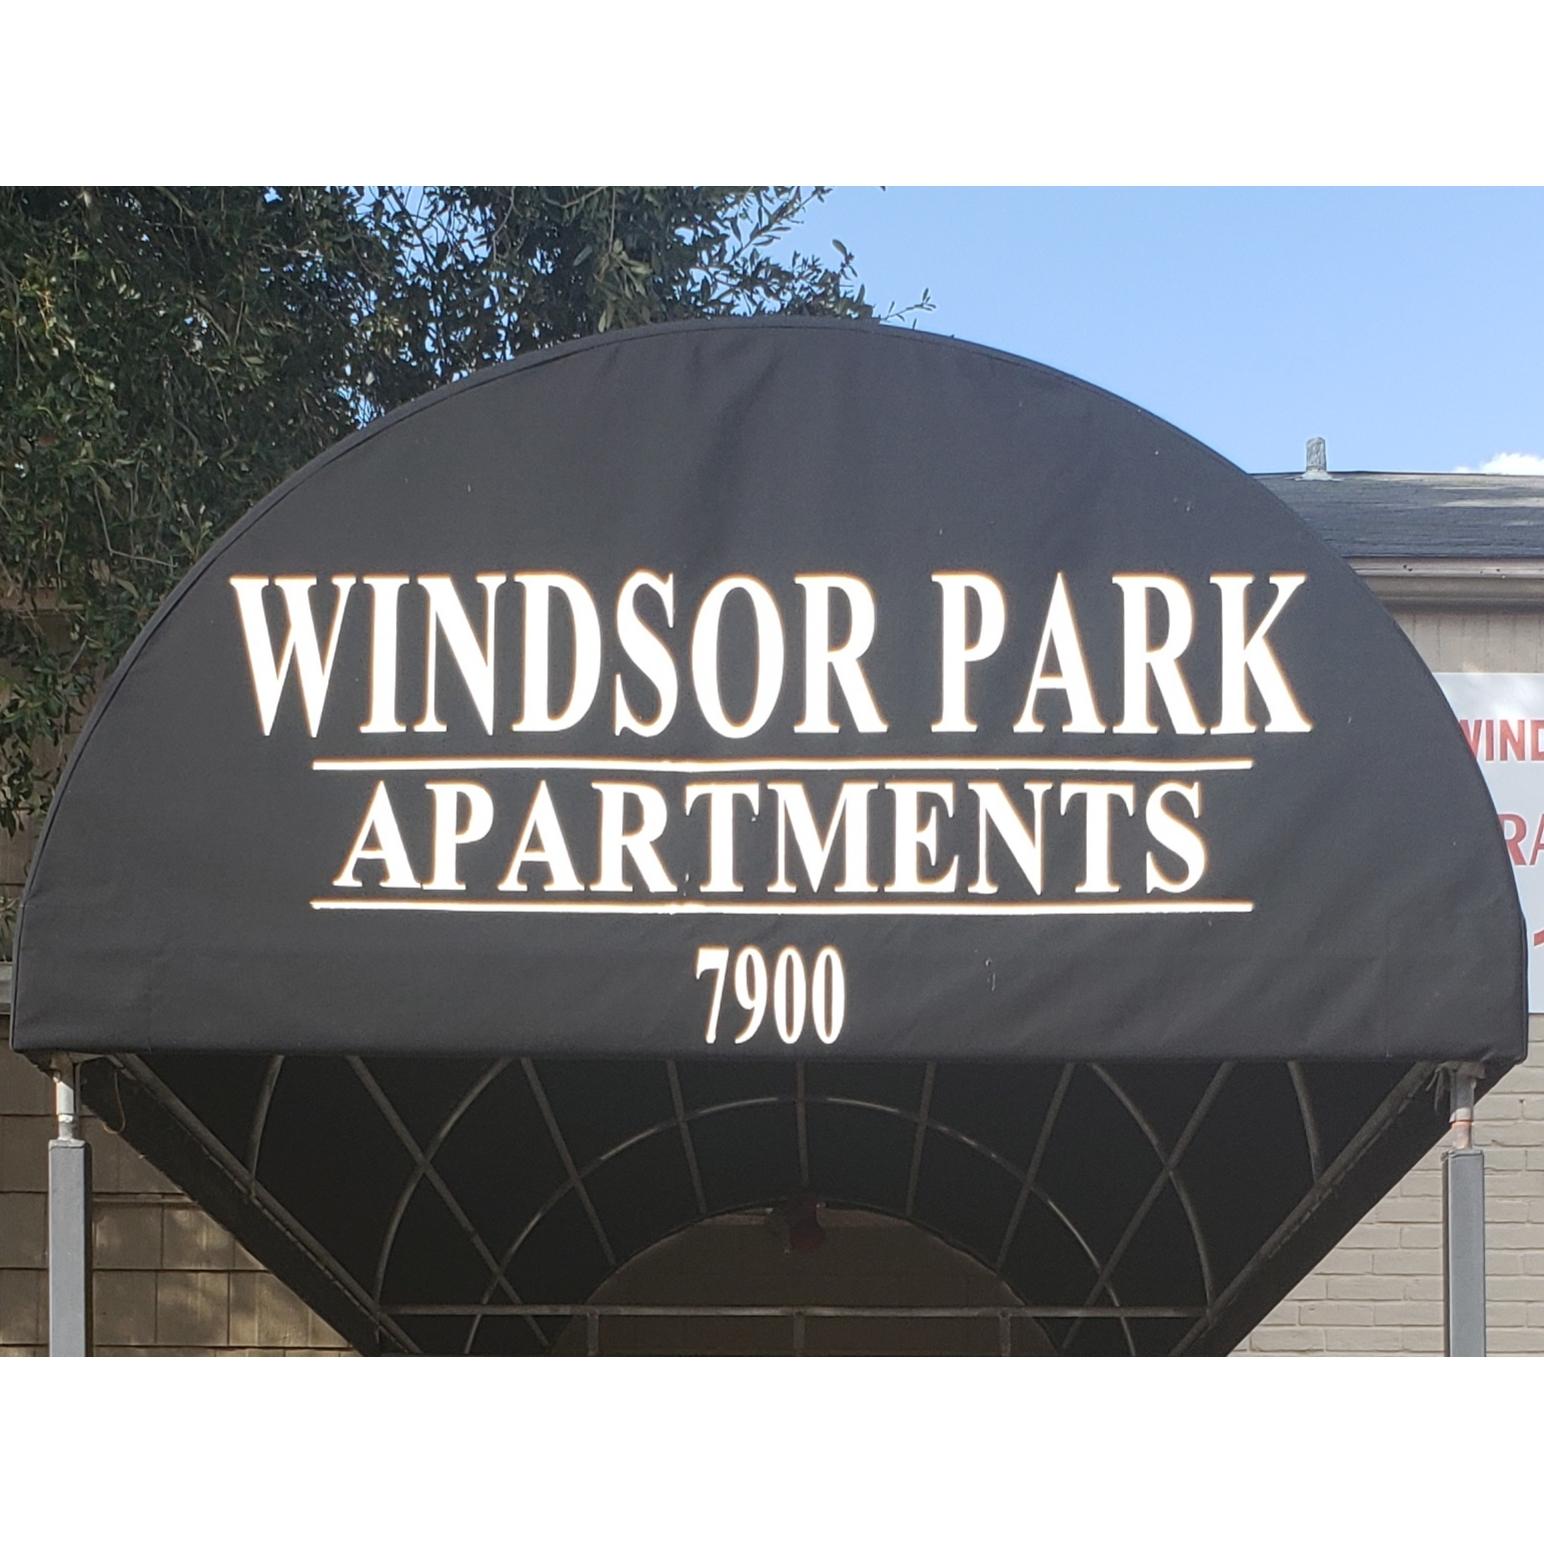 Windsor Park Apartments